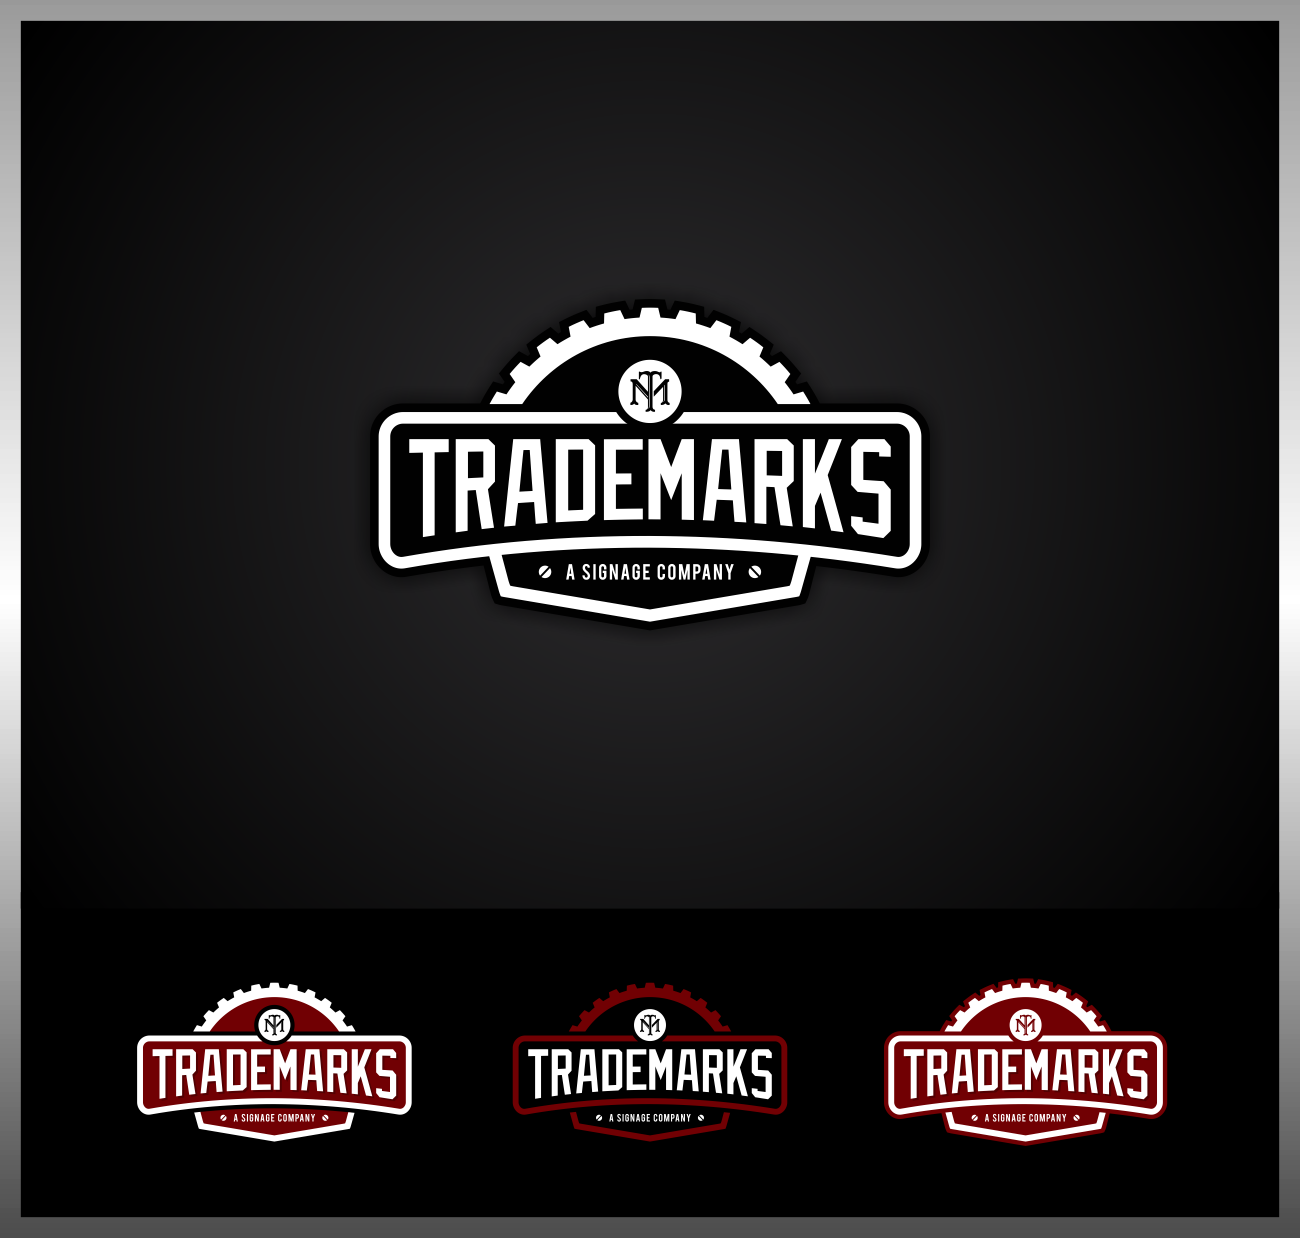 Trademarks - A Signage Company needs a new logo!